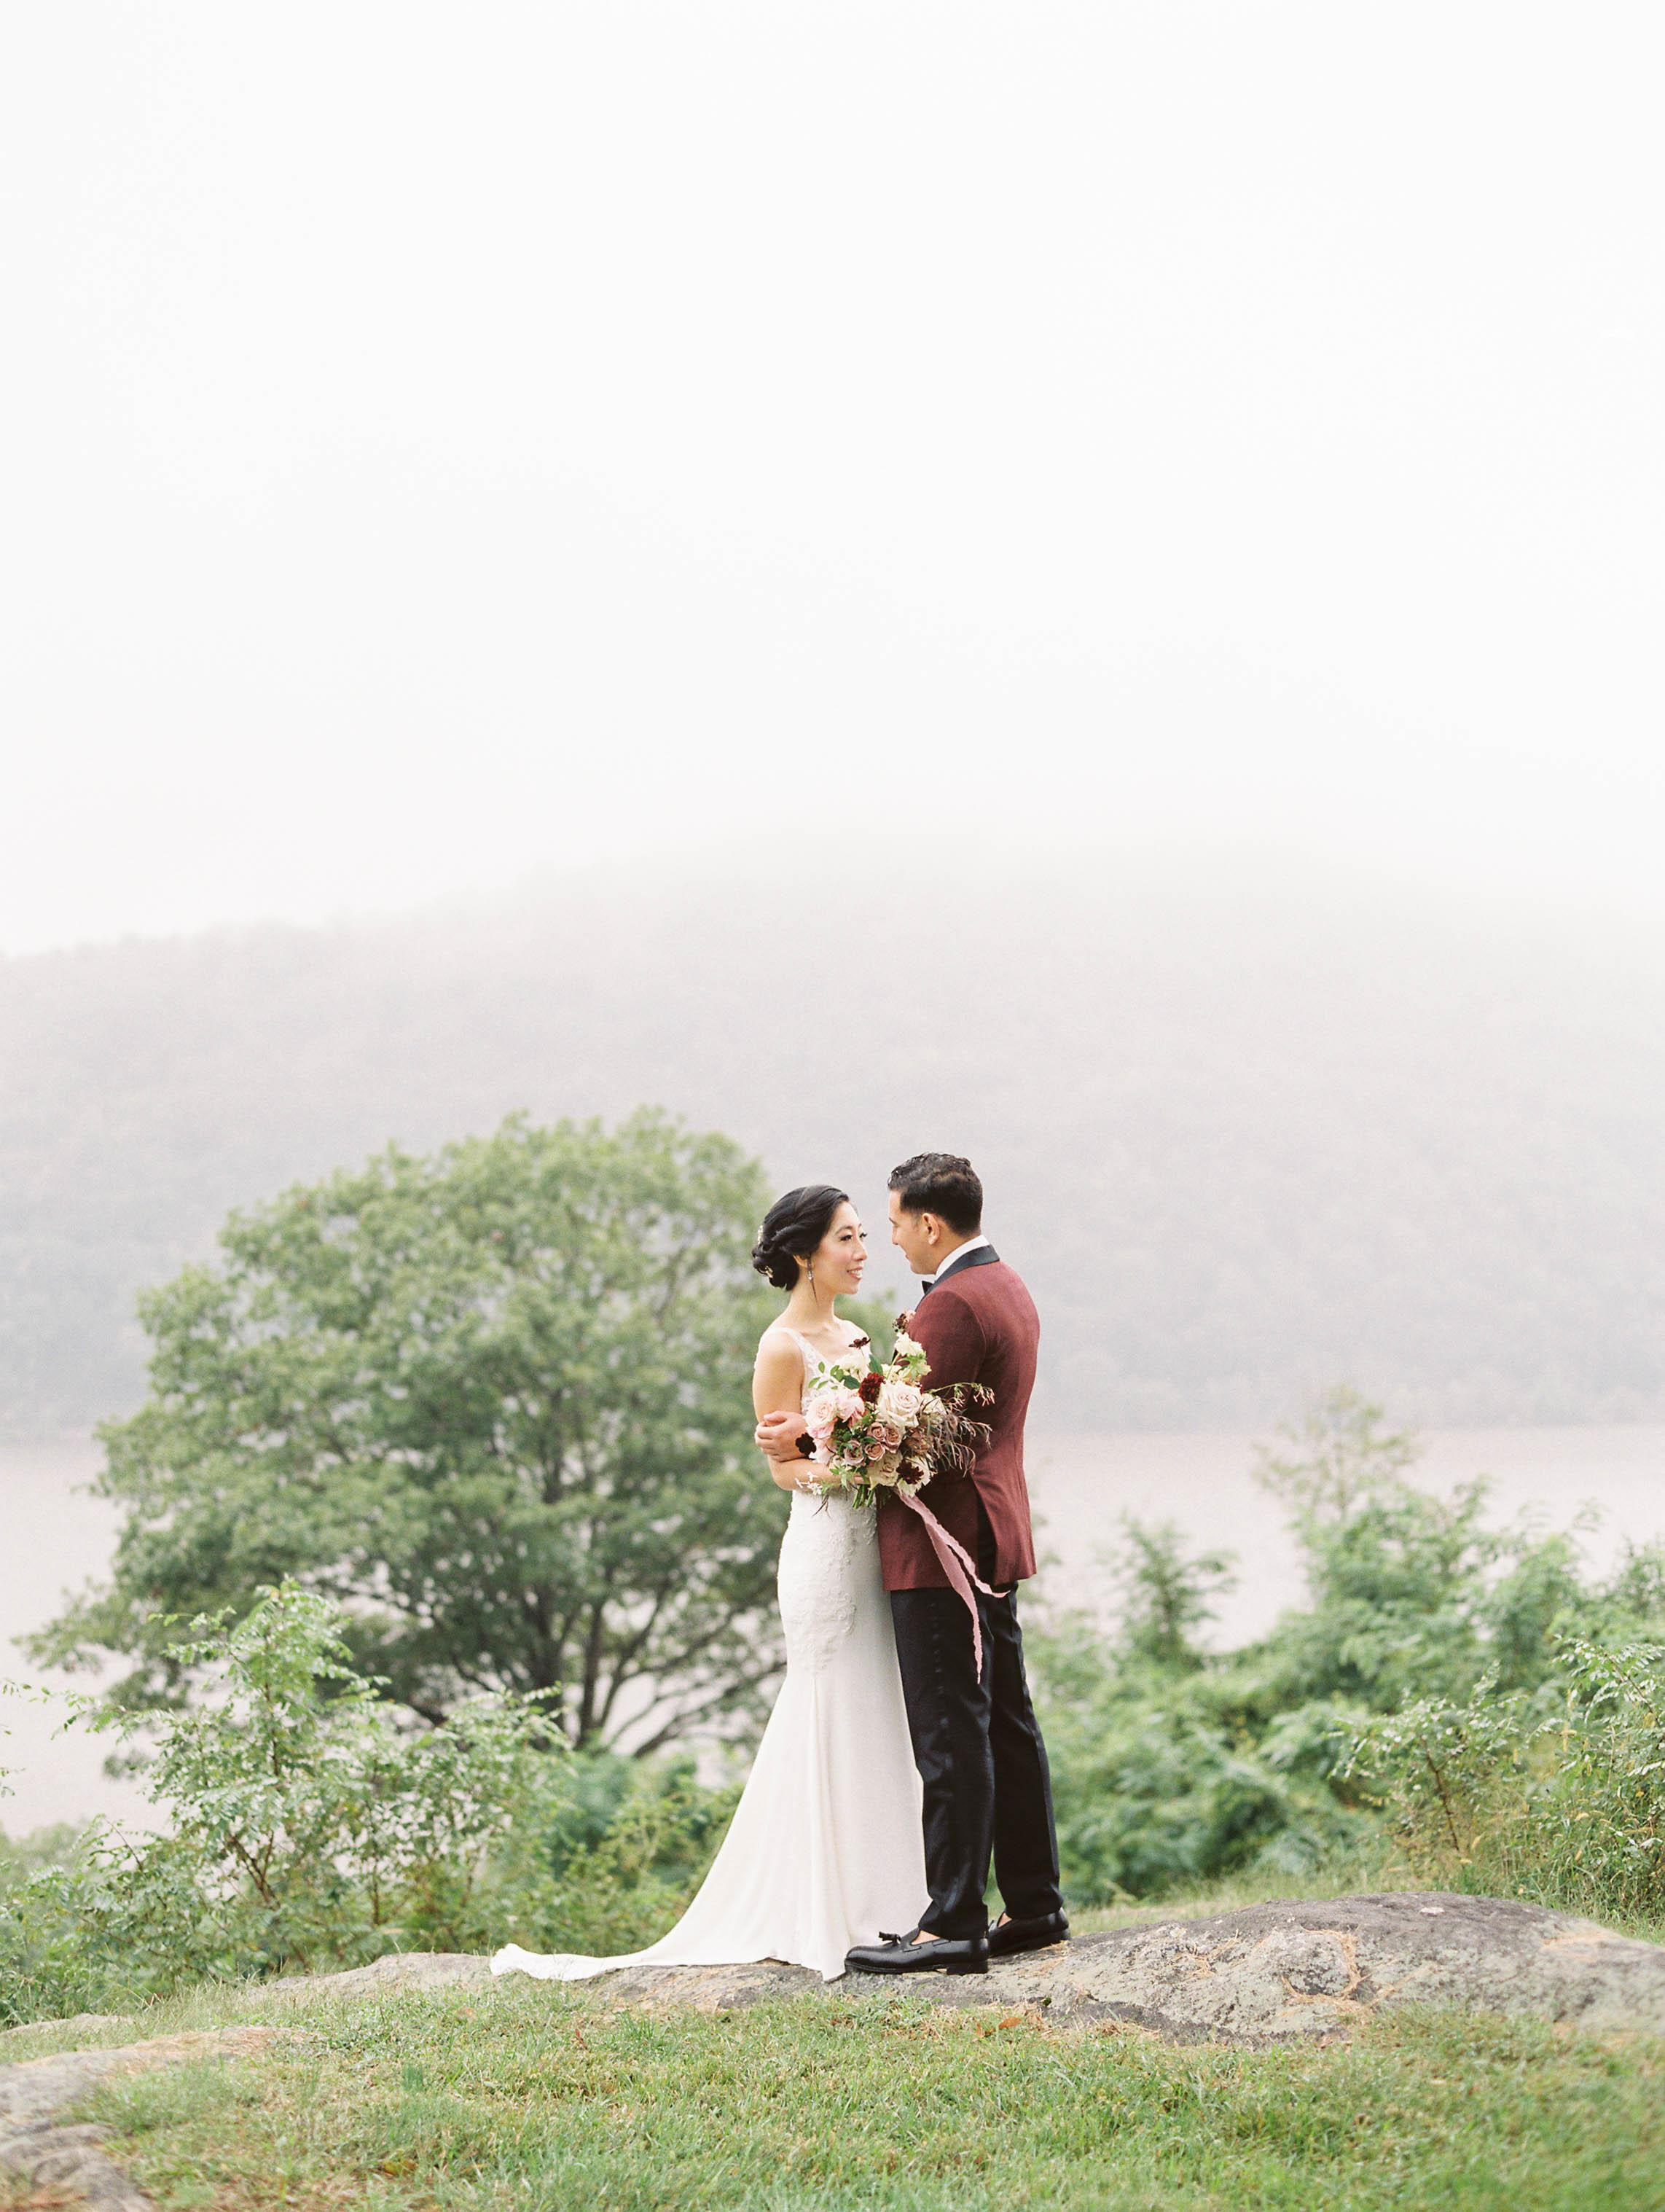 kelsandmichael_weddingphotography_ny-24.jpg